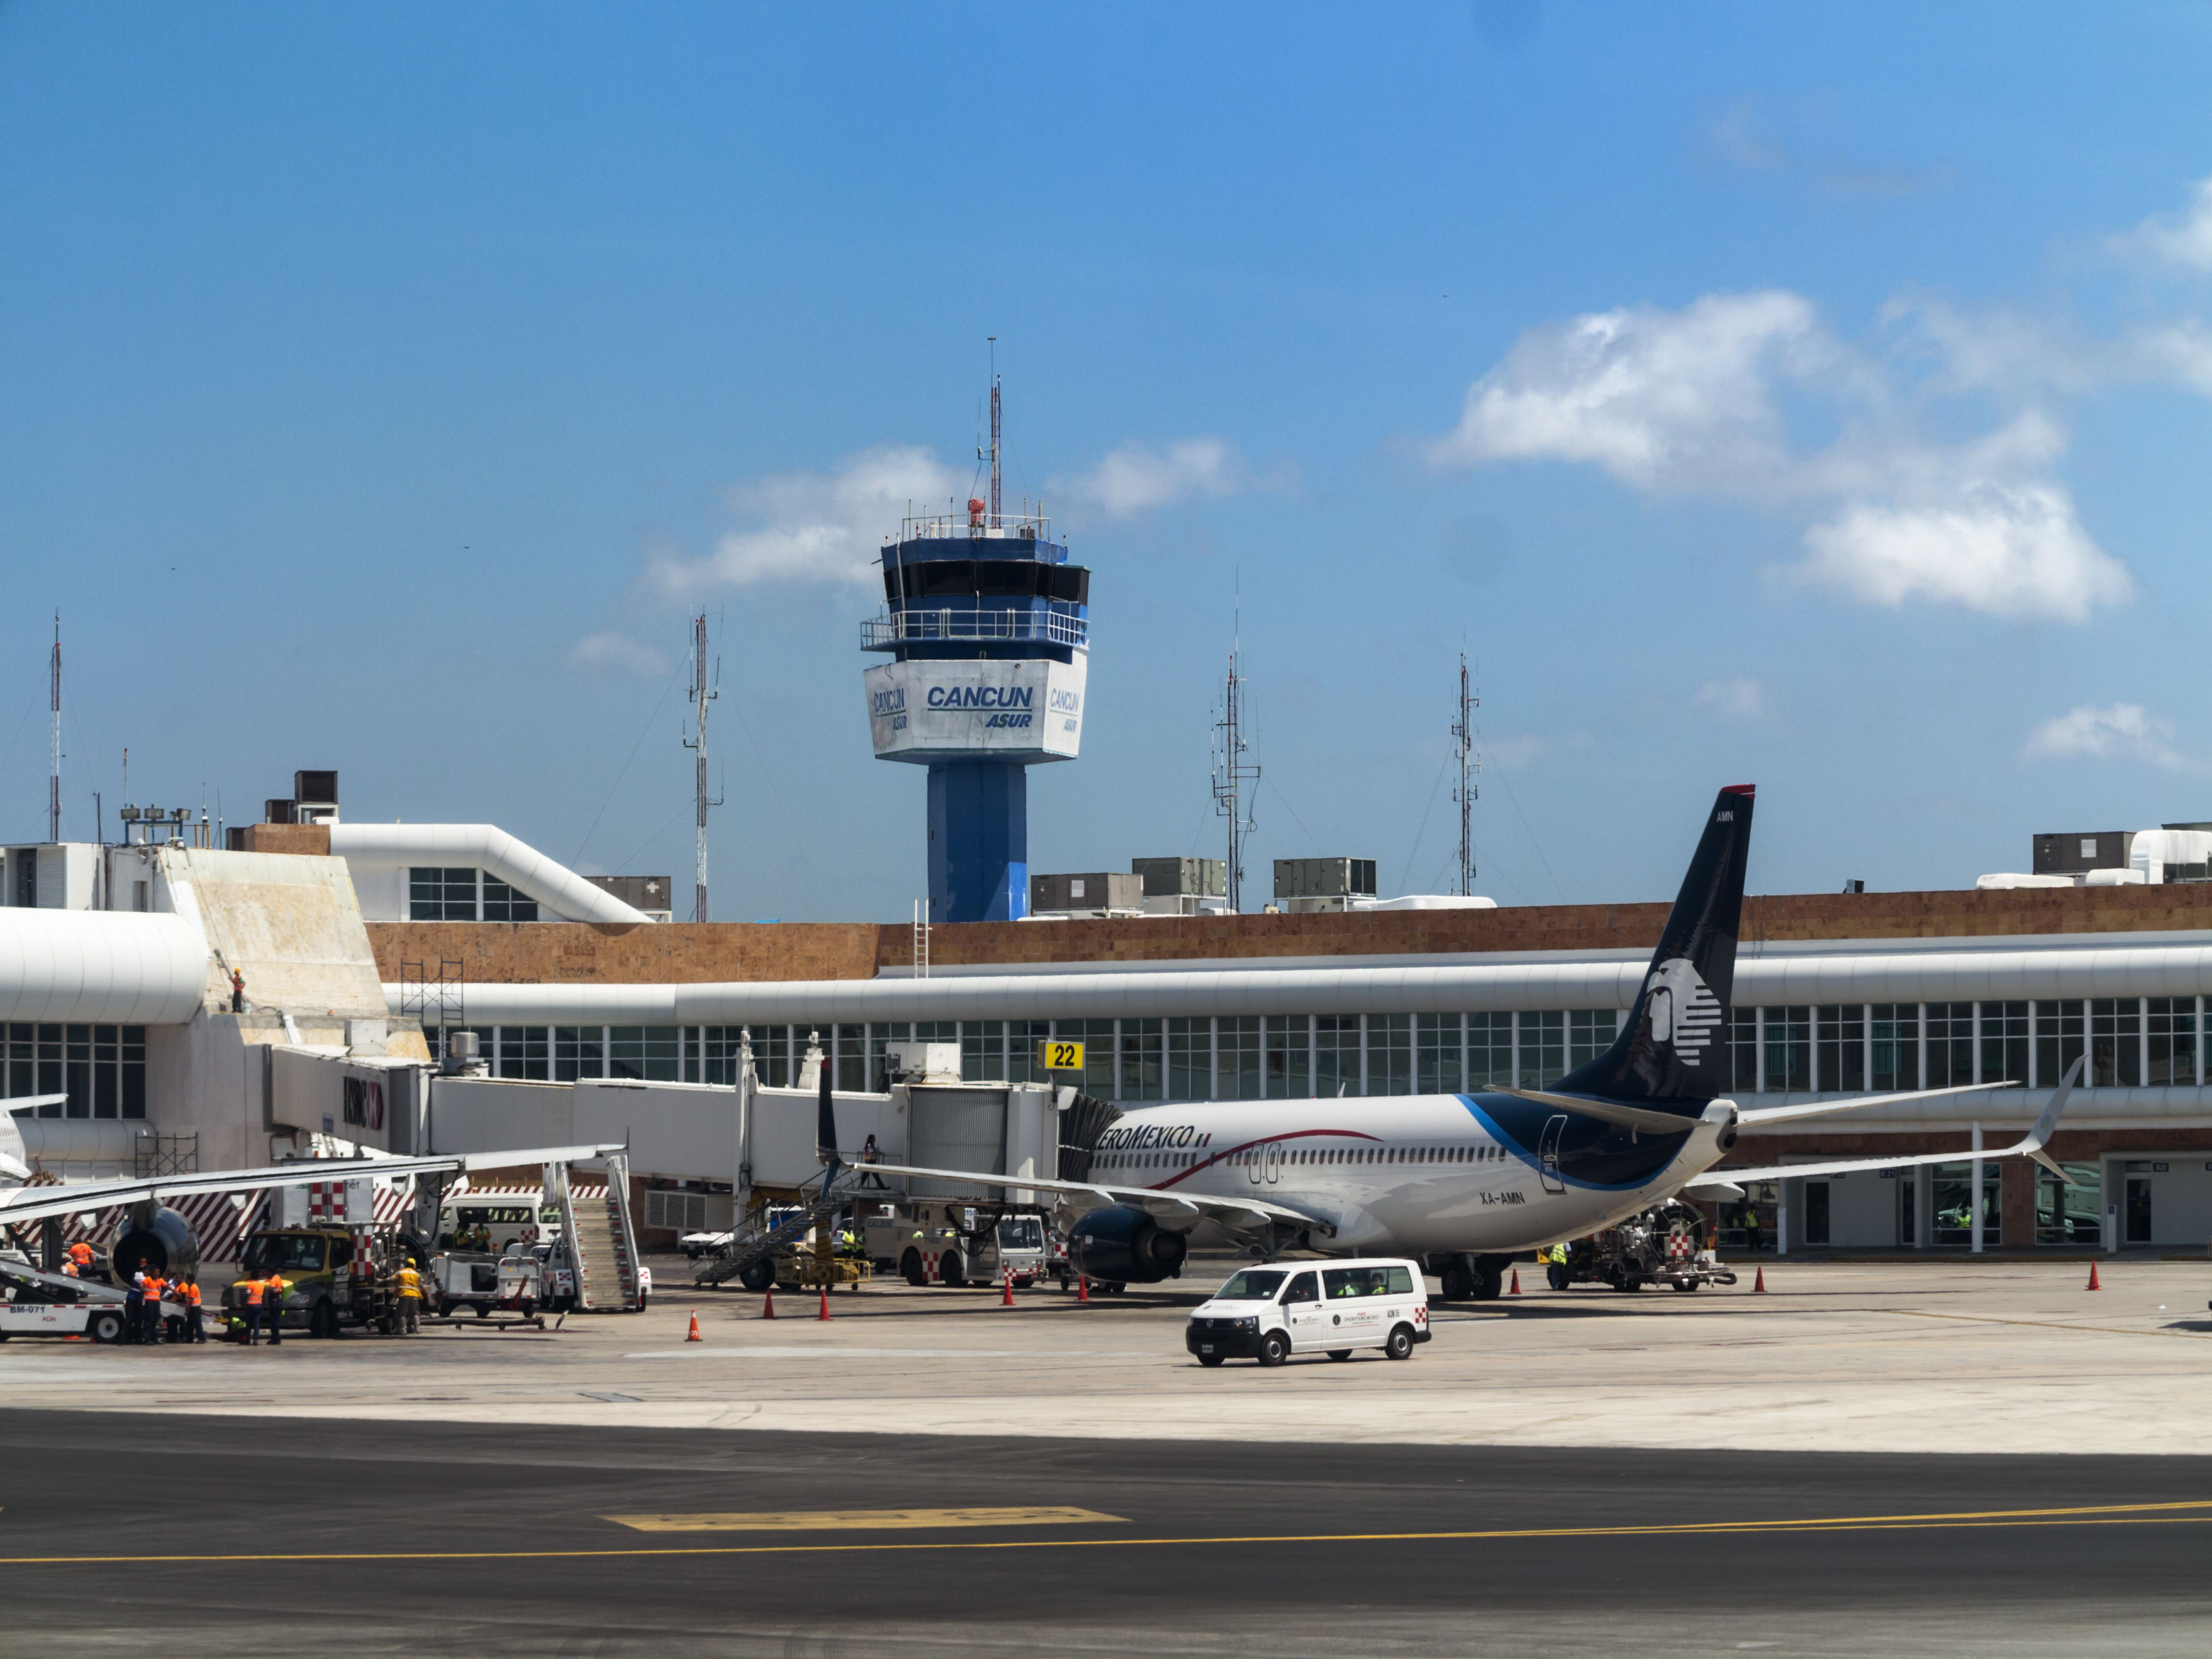 Airport Cancun Ankunft